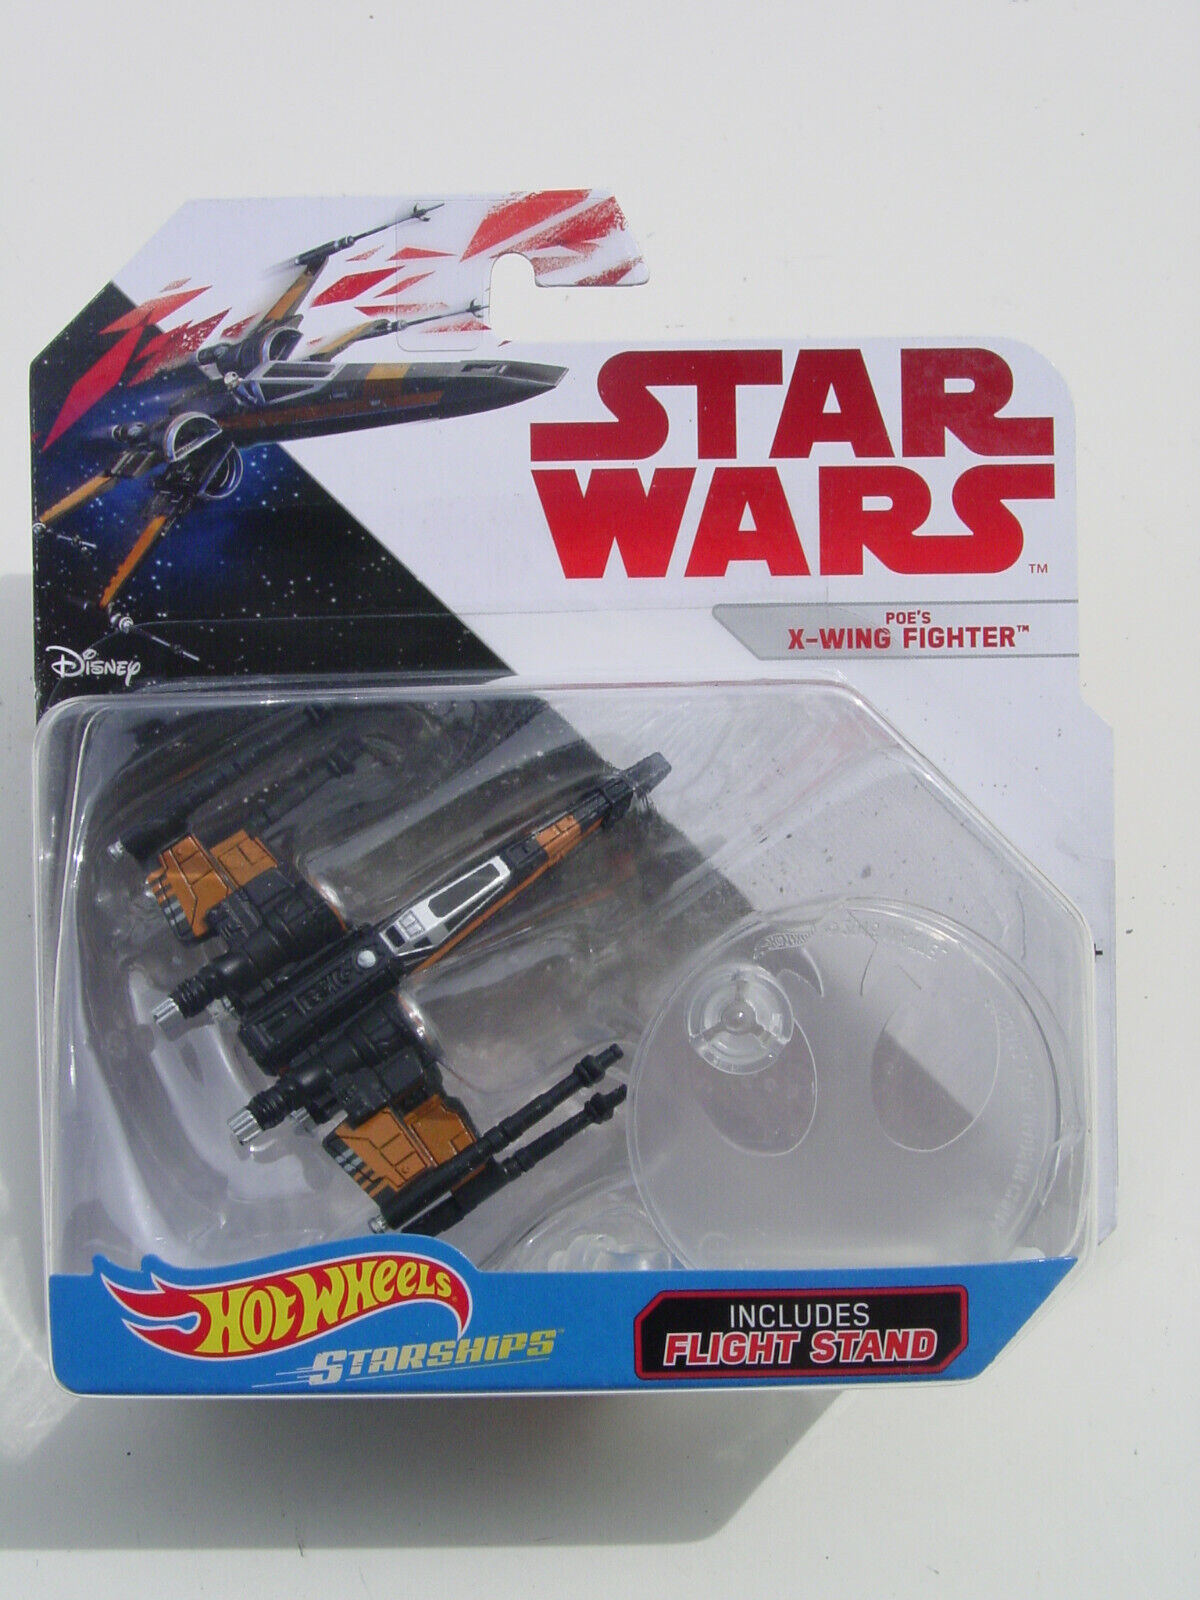 Disney Star Wars Starships Diecast Hot Wheels Poe/'s X-Wing Fighter Flight Stand